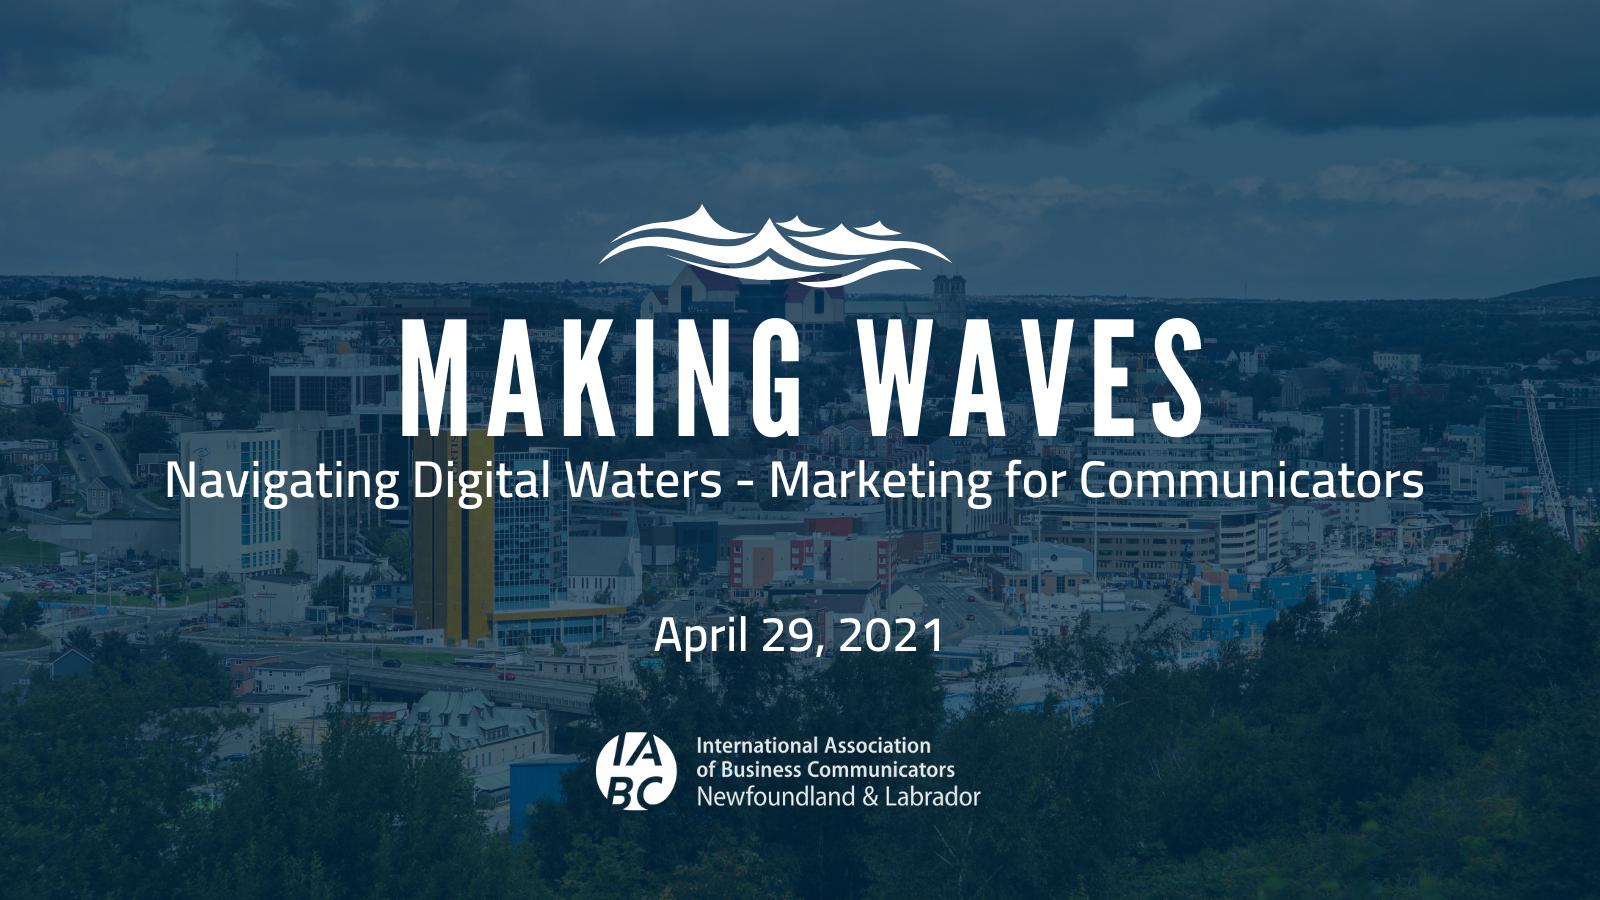 Making Waves – Navigating Digital Waters - Marketing for Communicators